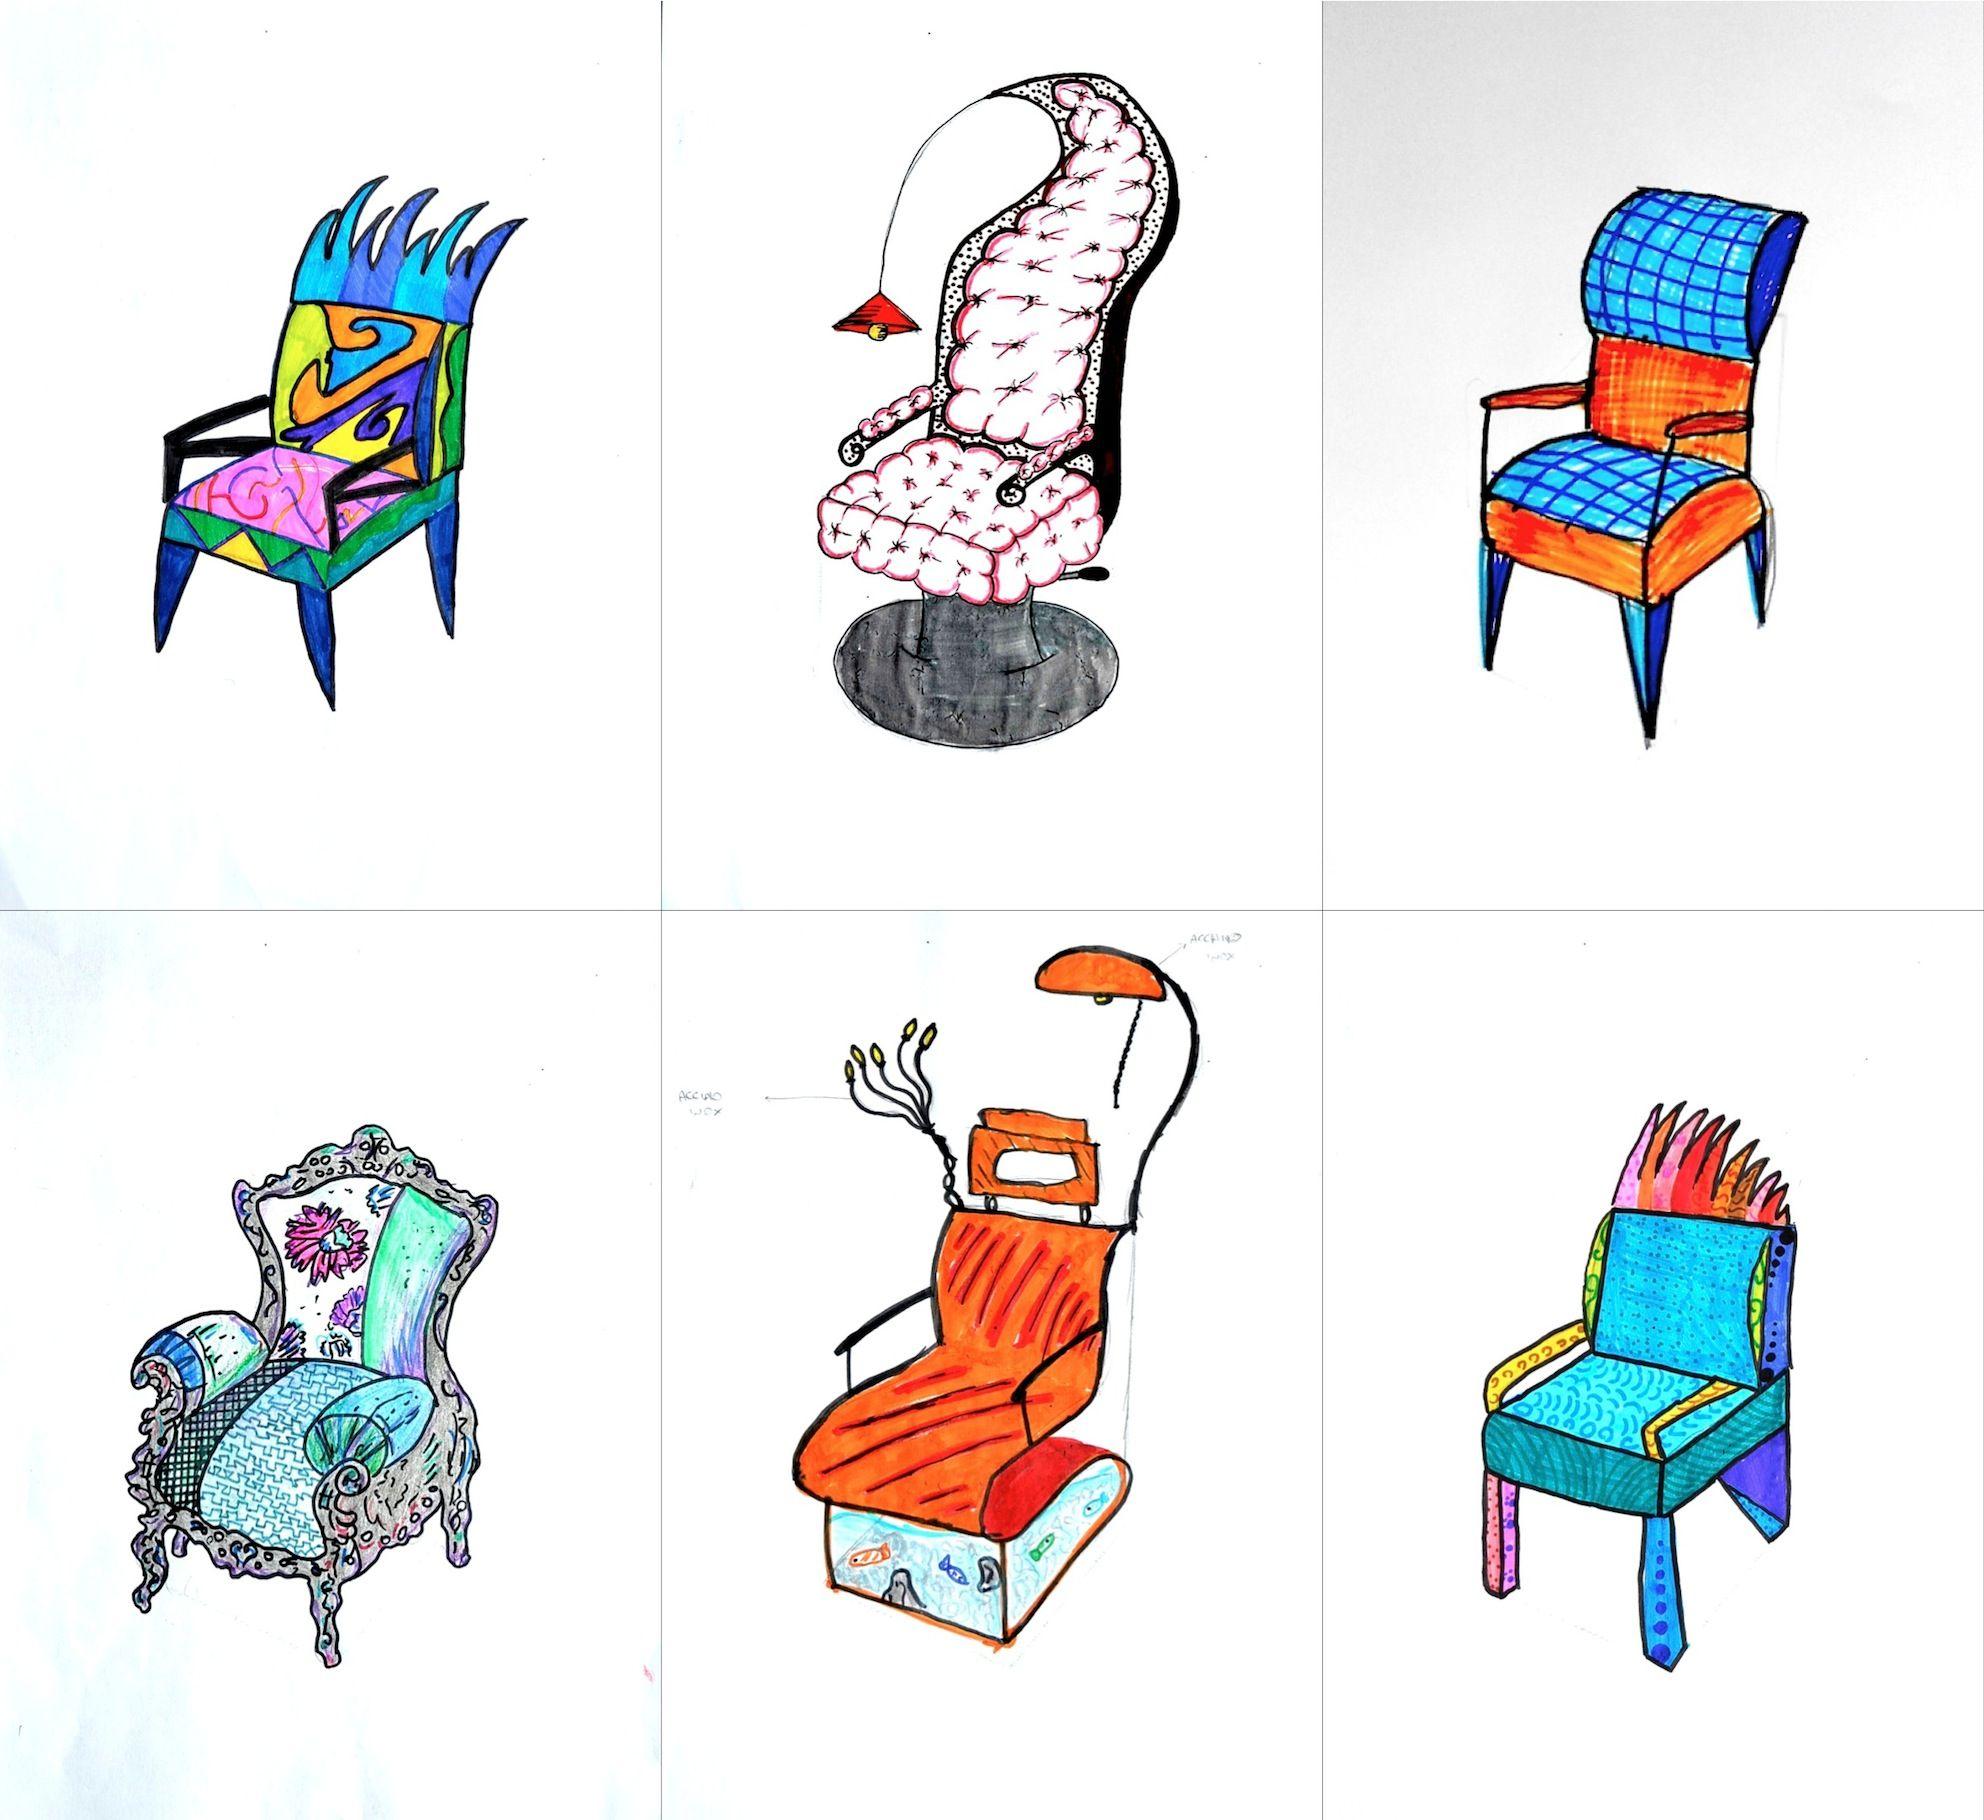 Design A Chair Worksheet